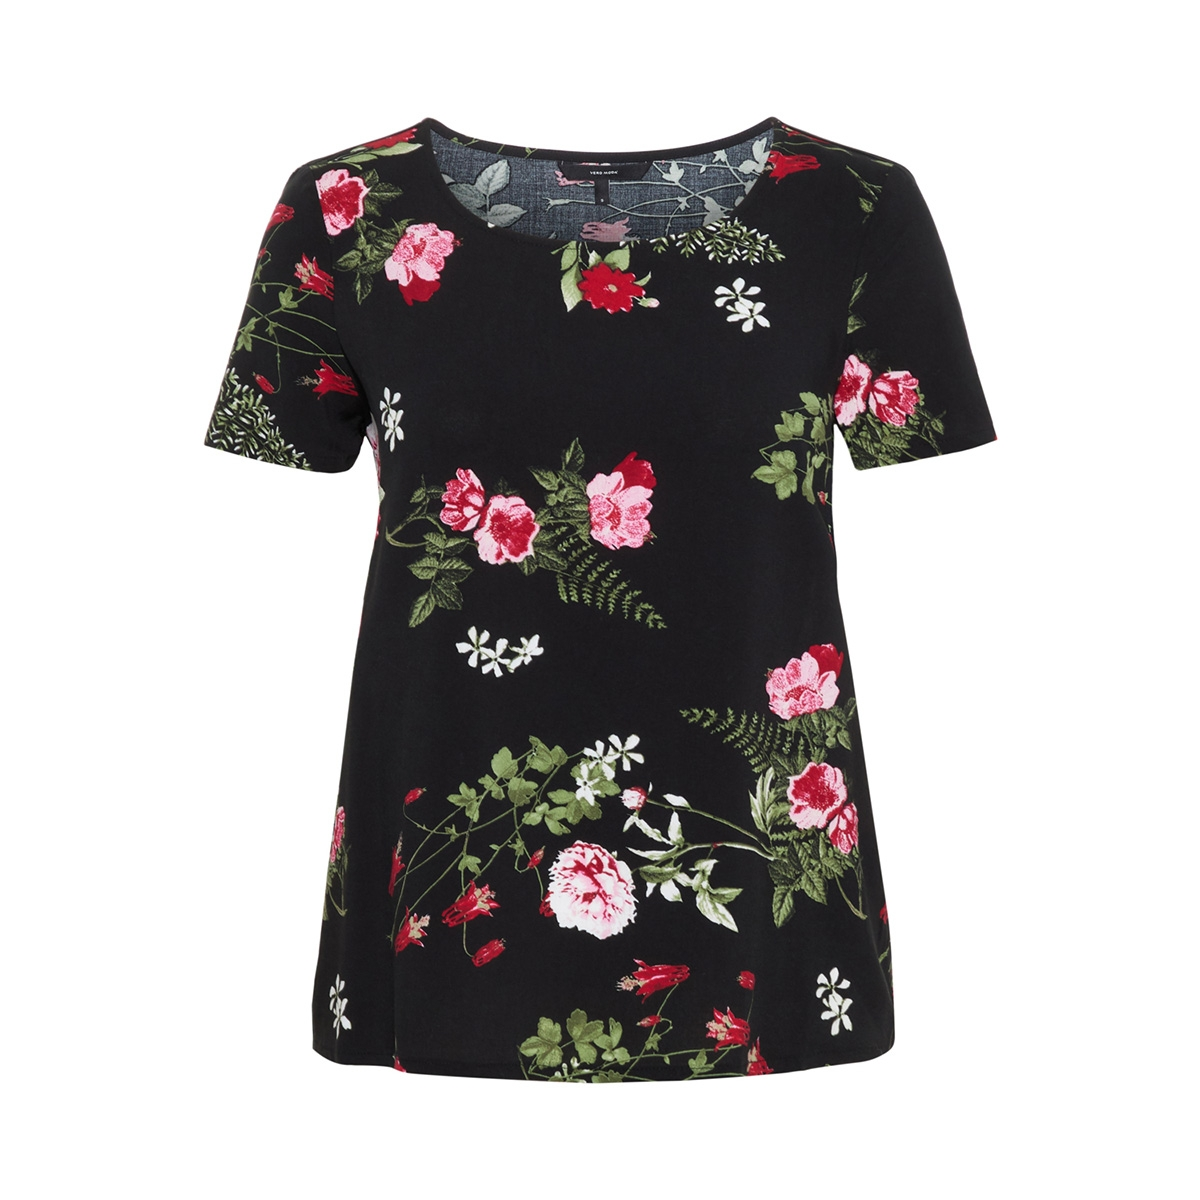 vmsimply easy ss top 10211480 vero moda t-shirt black/laila black